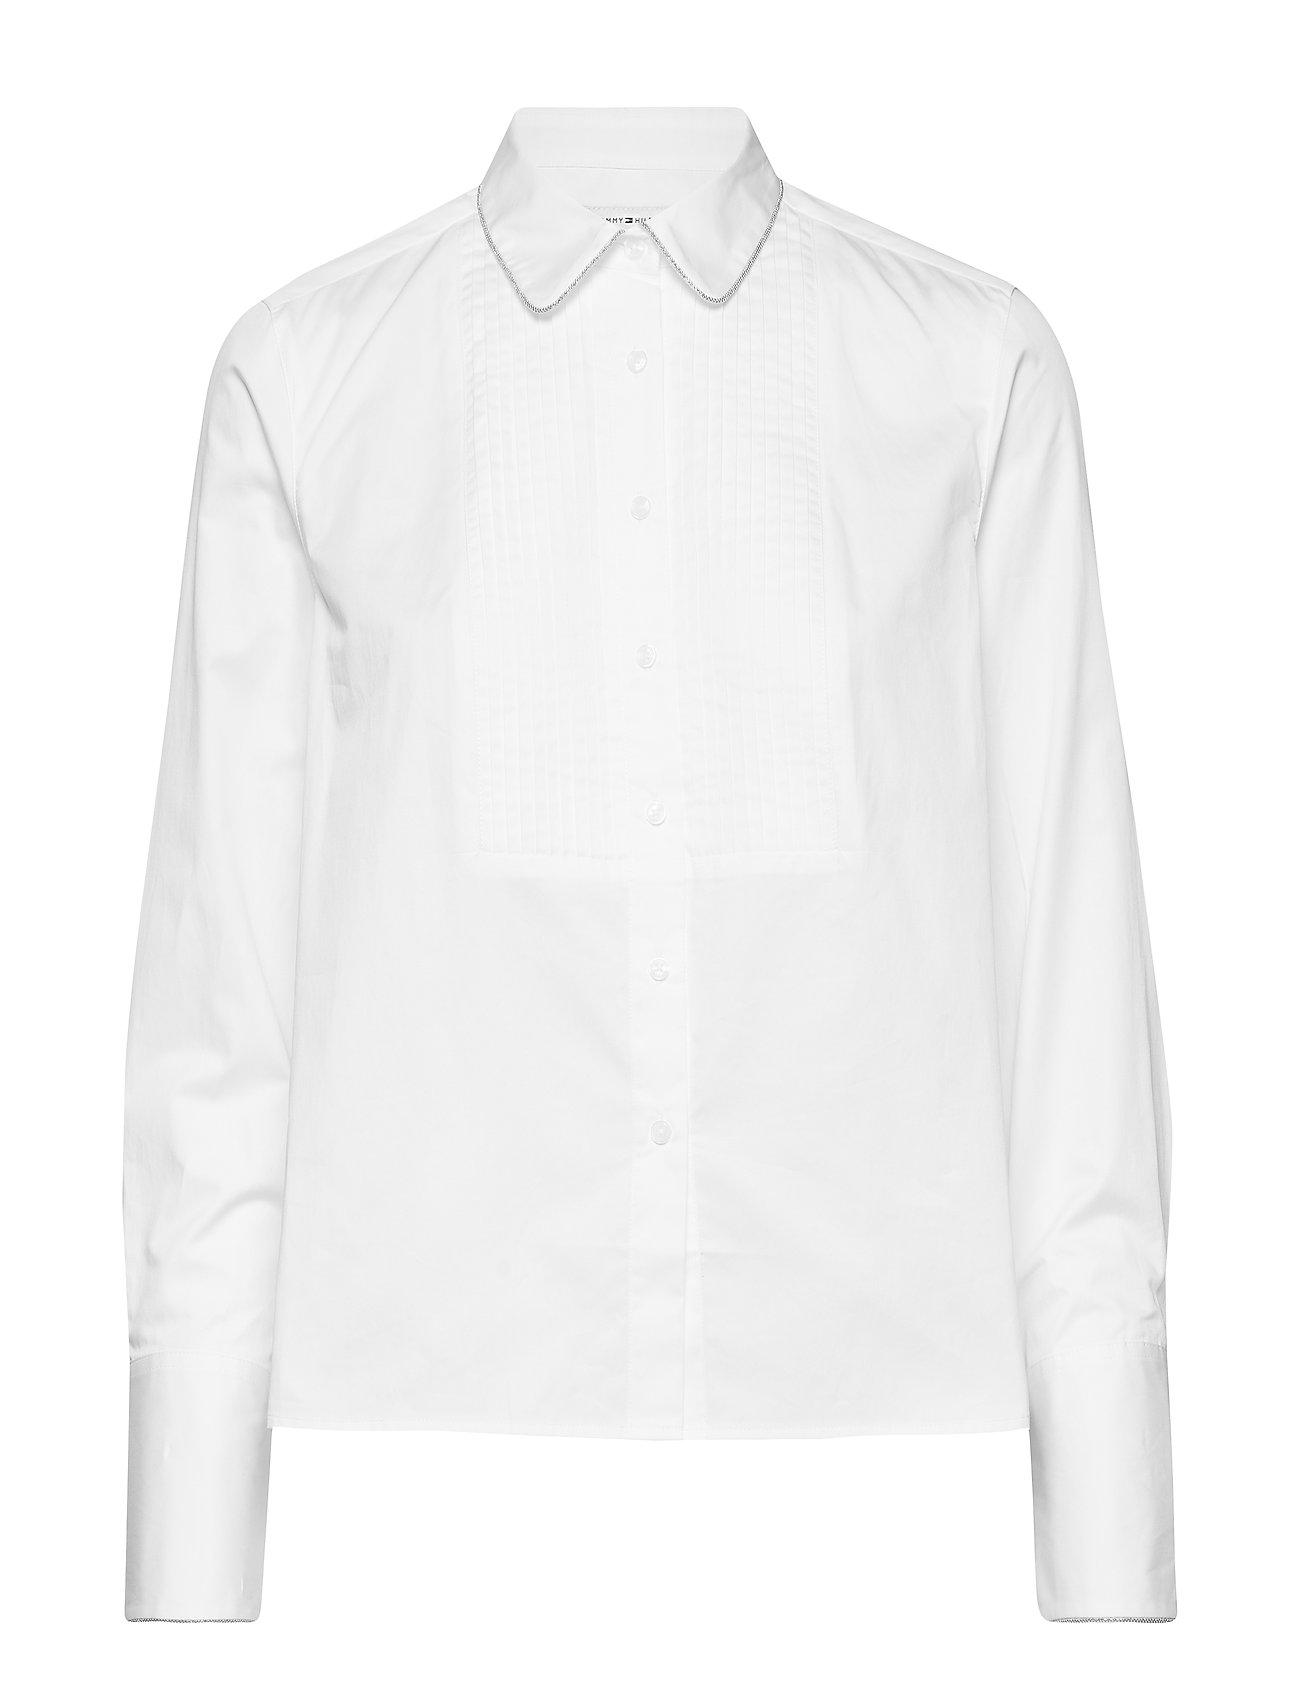 Tommy Hilfiger LULU SHIRT LS - CLASSIC WHITE